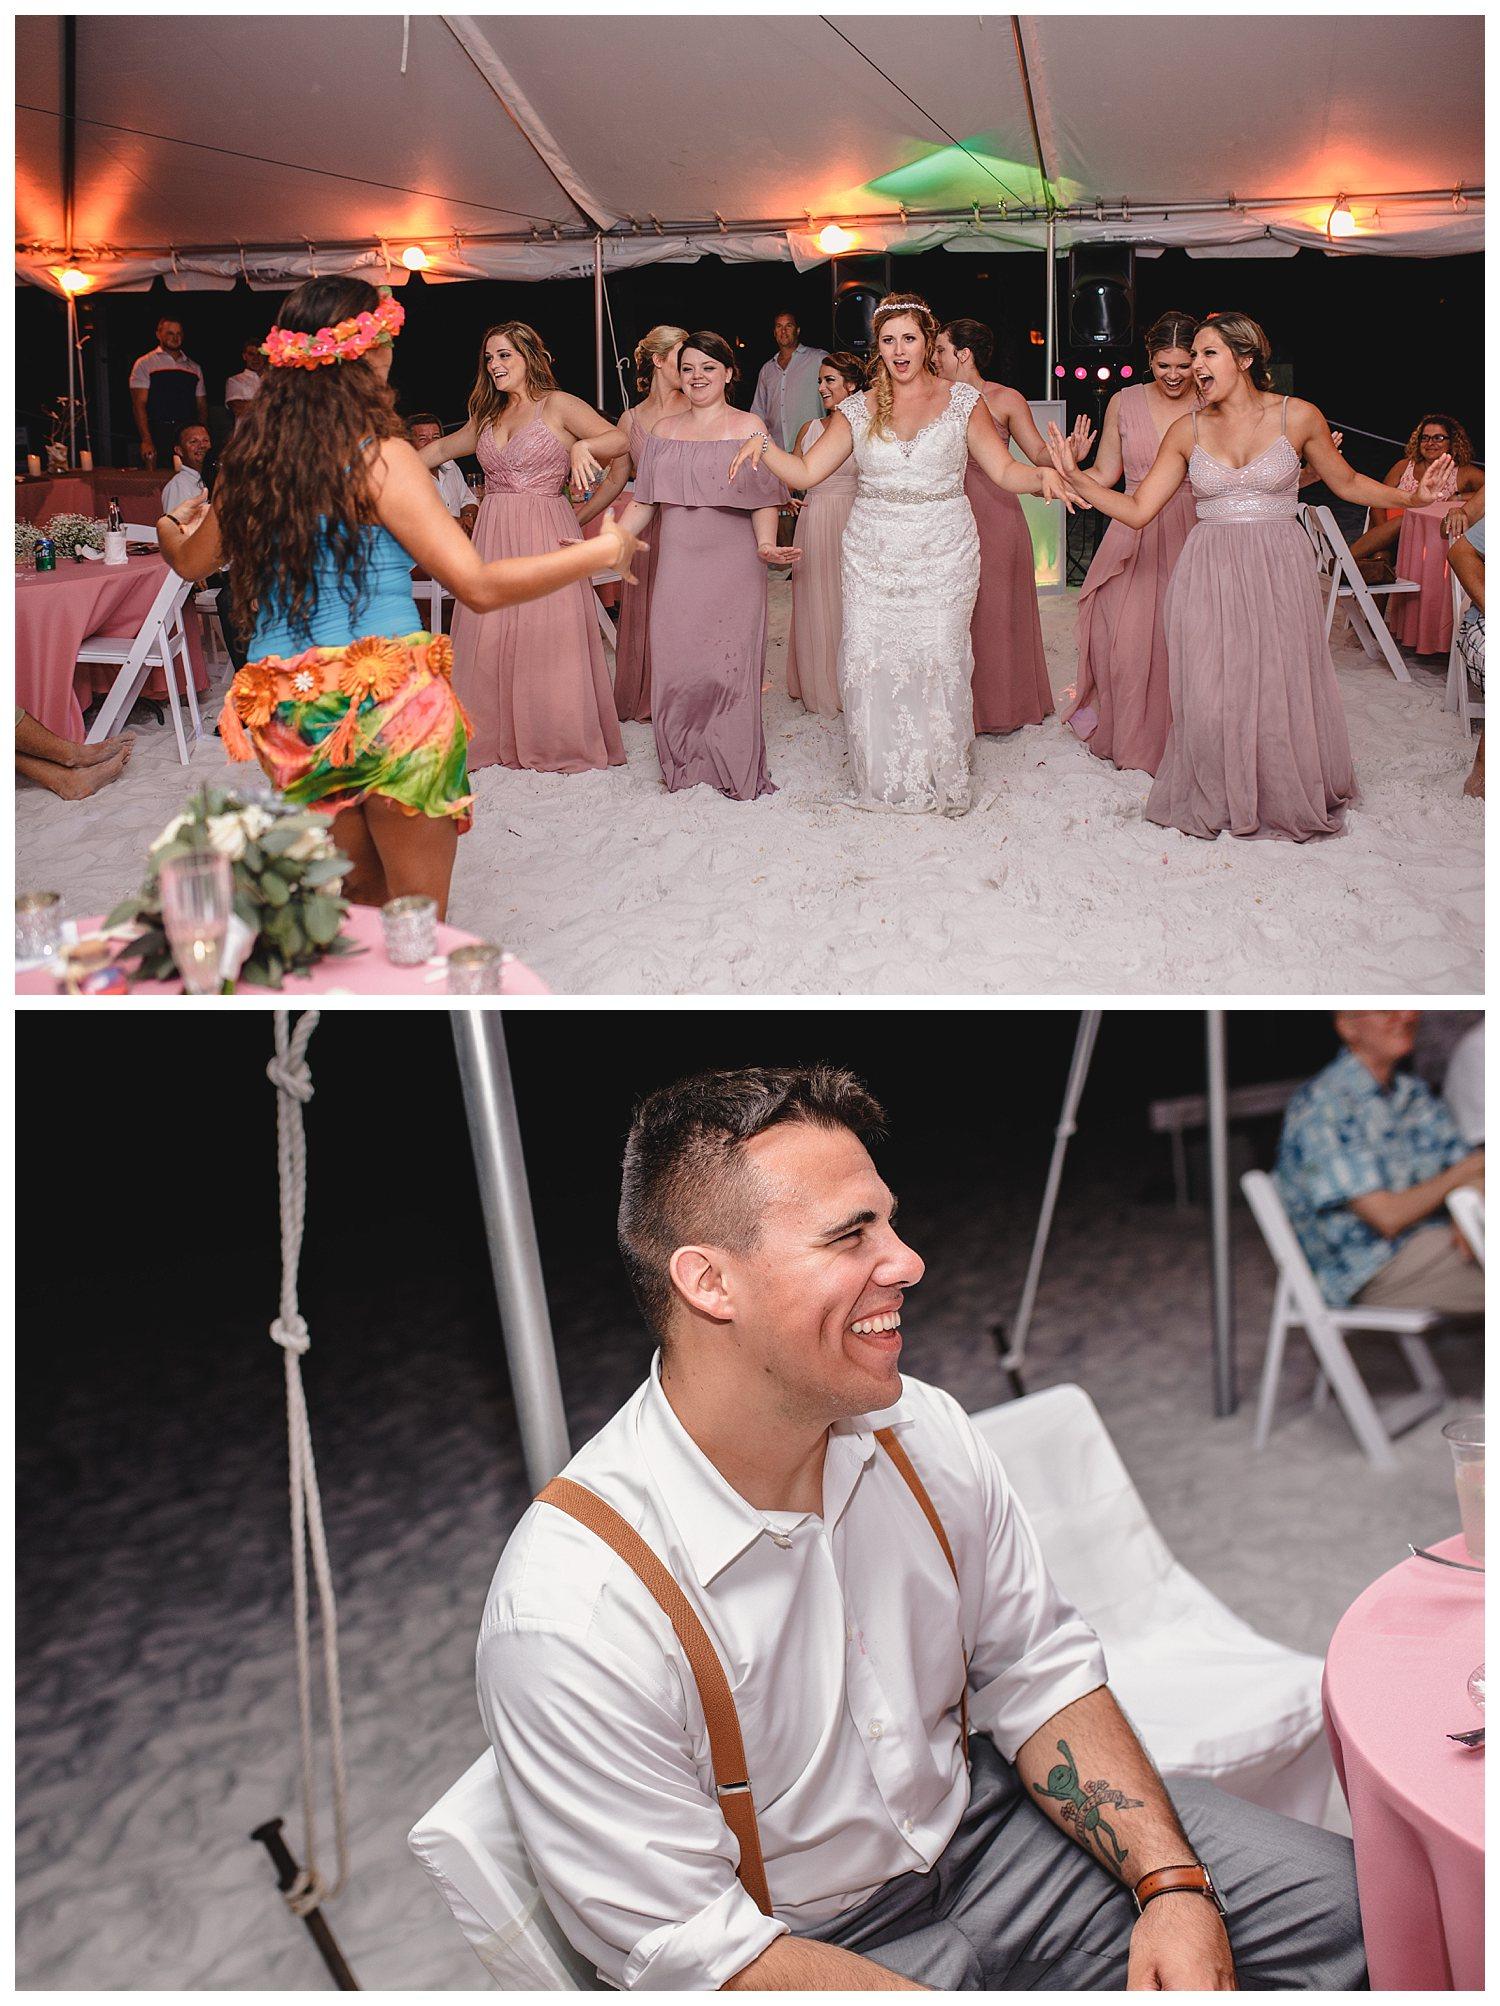 Kelsey_Diane_Photography_Destination_Wedding_Sarasota_Florida_Beach_Wedding_Alex_Austin_0688.jpg